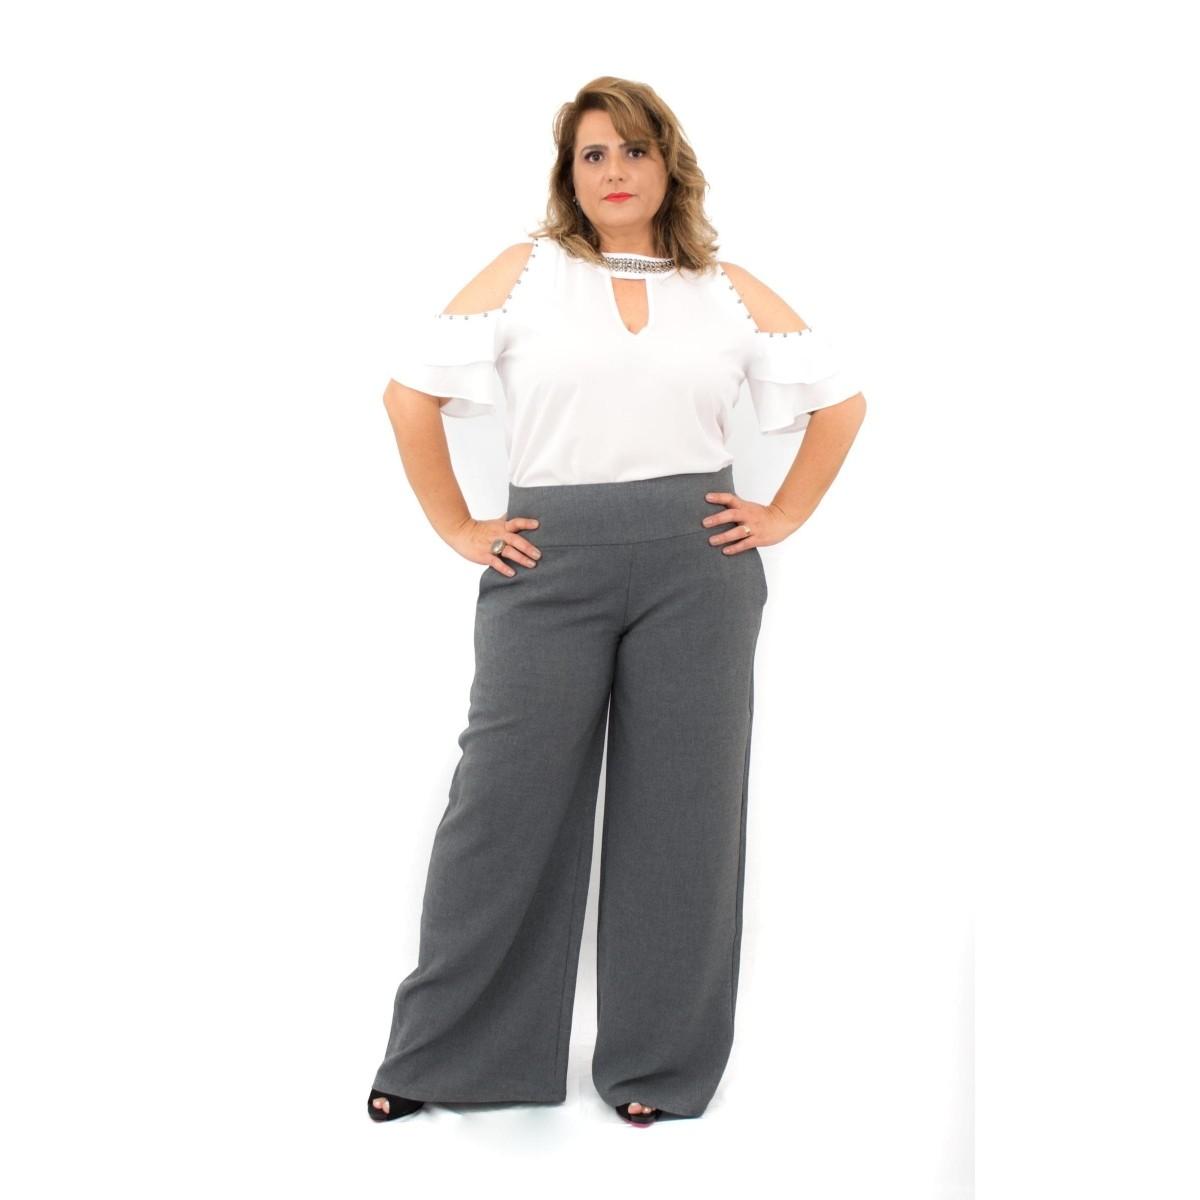 Calça Plus Size Pantalona Linhão  Poliéster